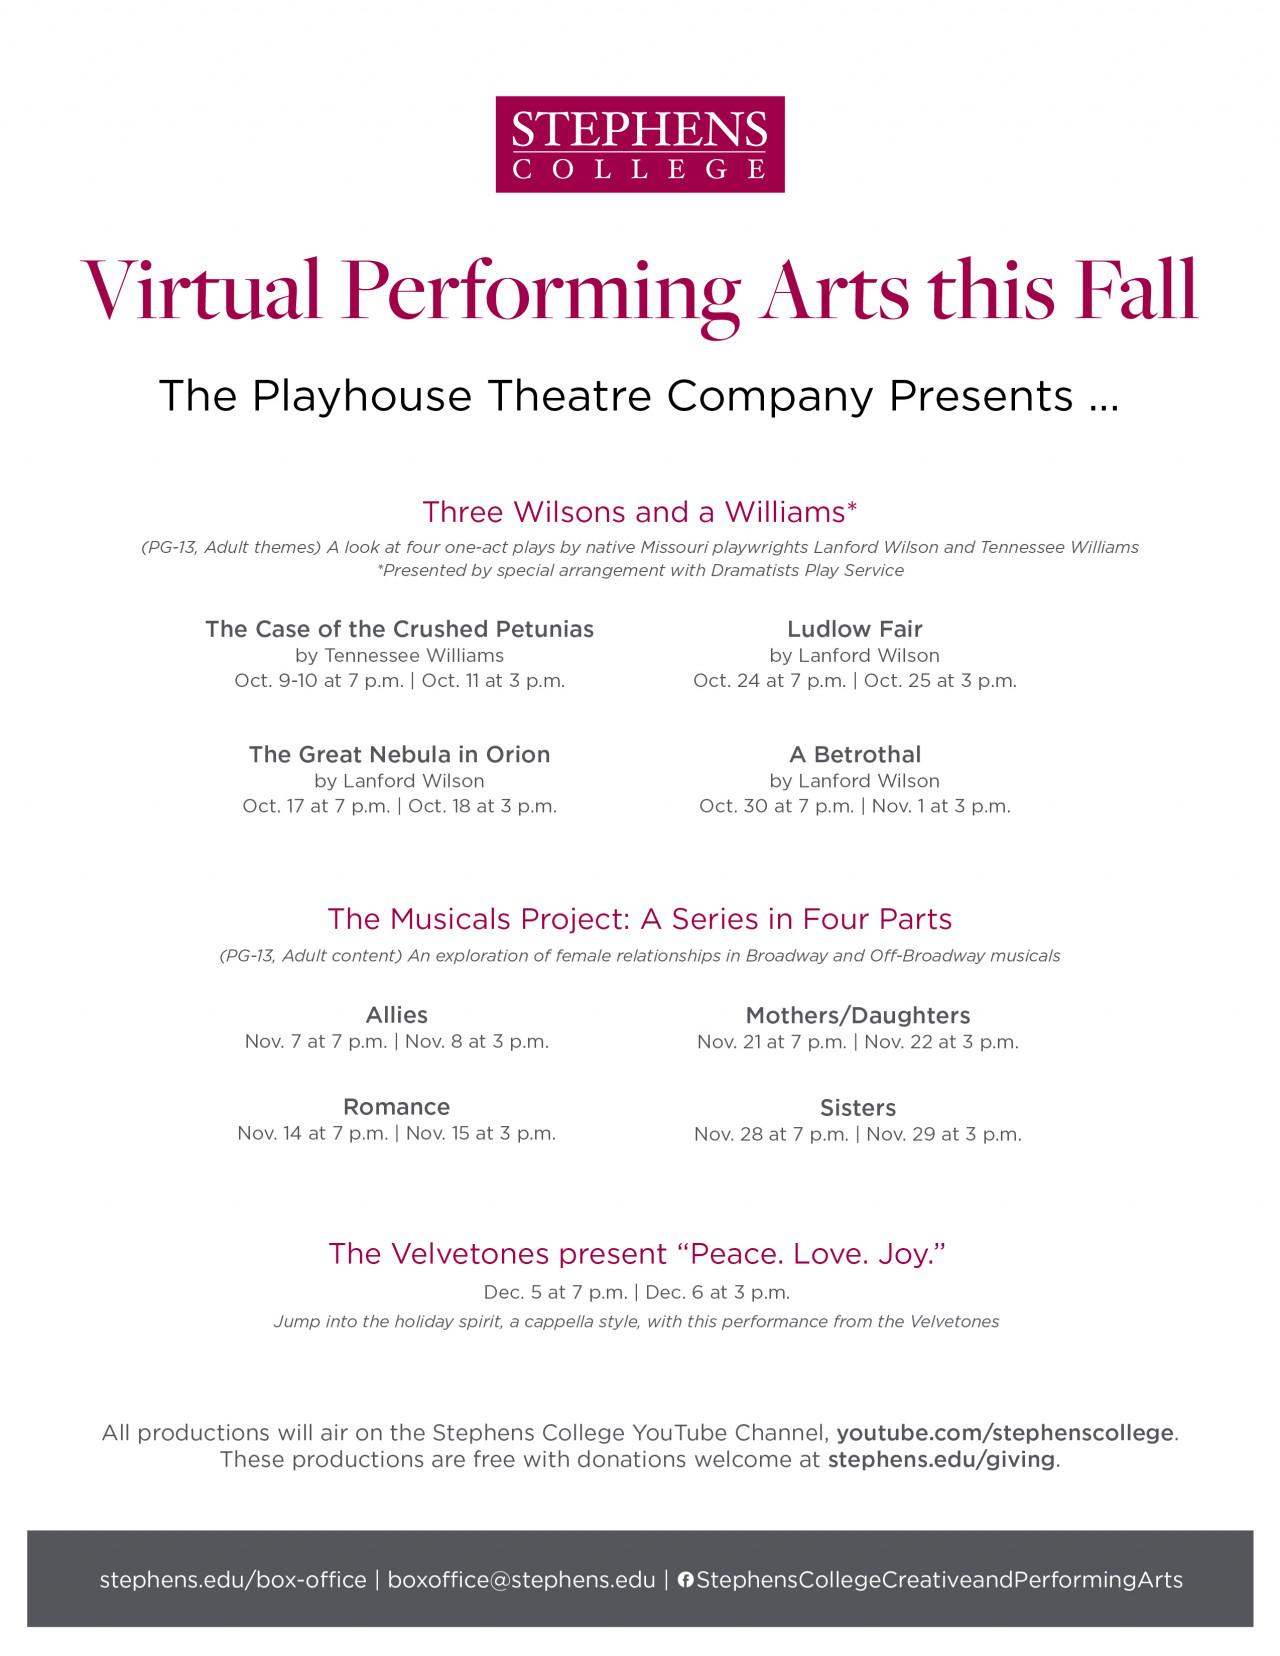 Fall 2020 Virtual Performing Arts Season